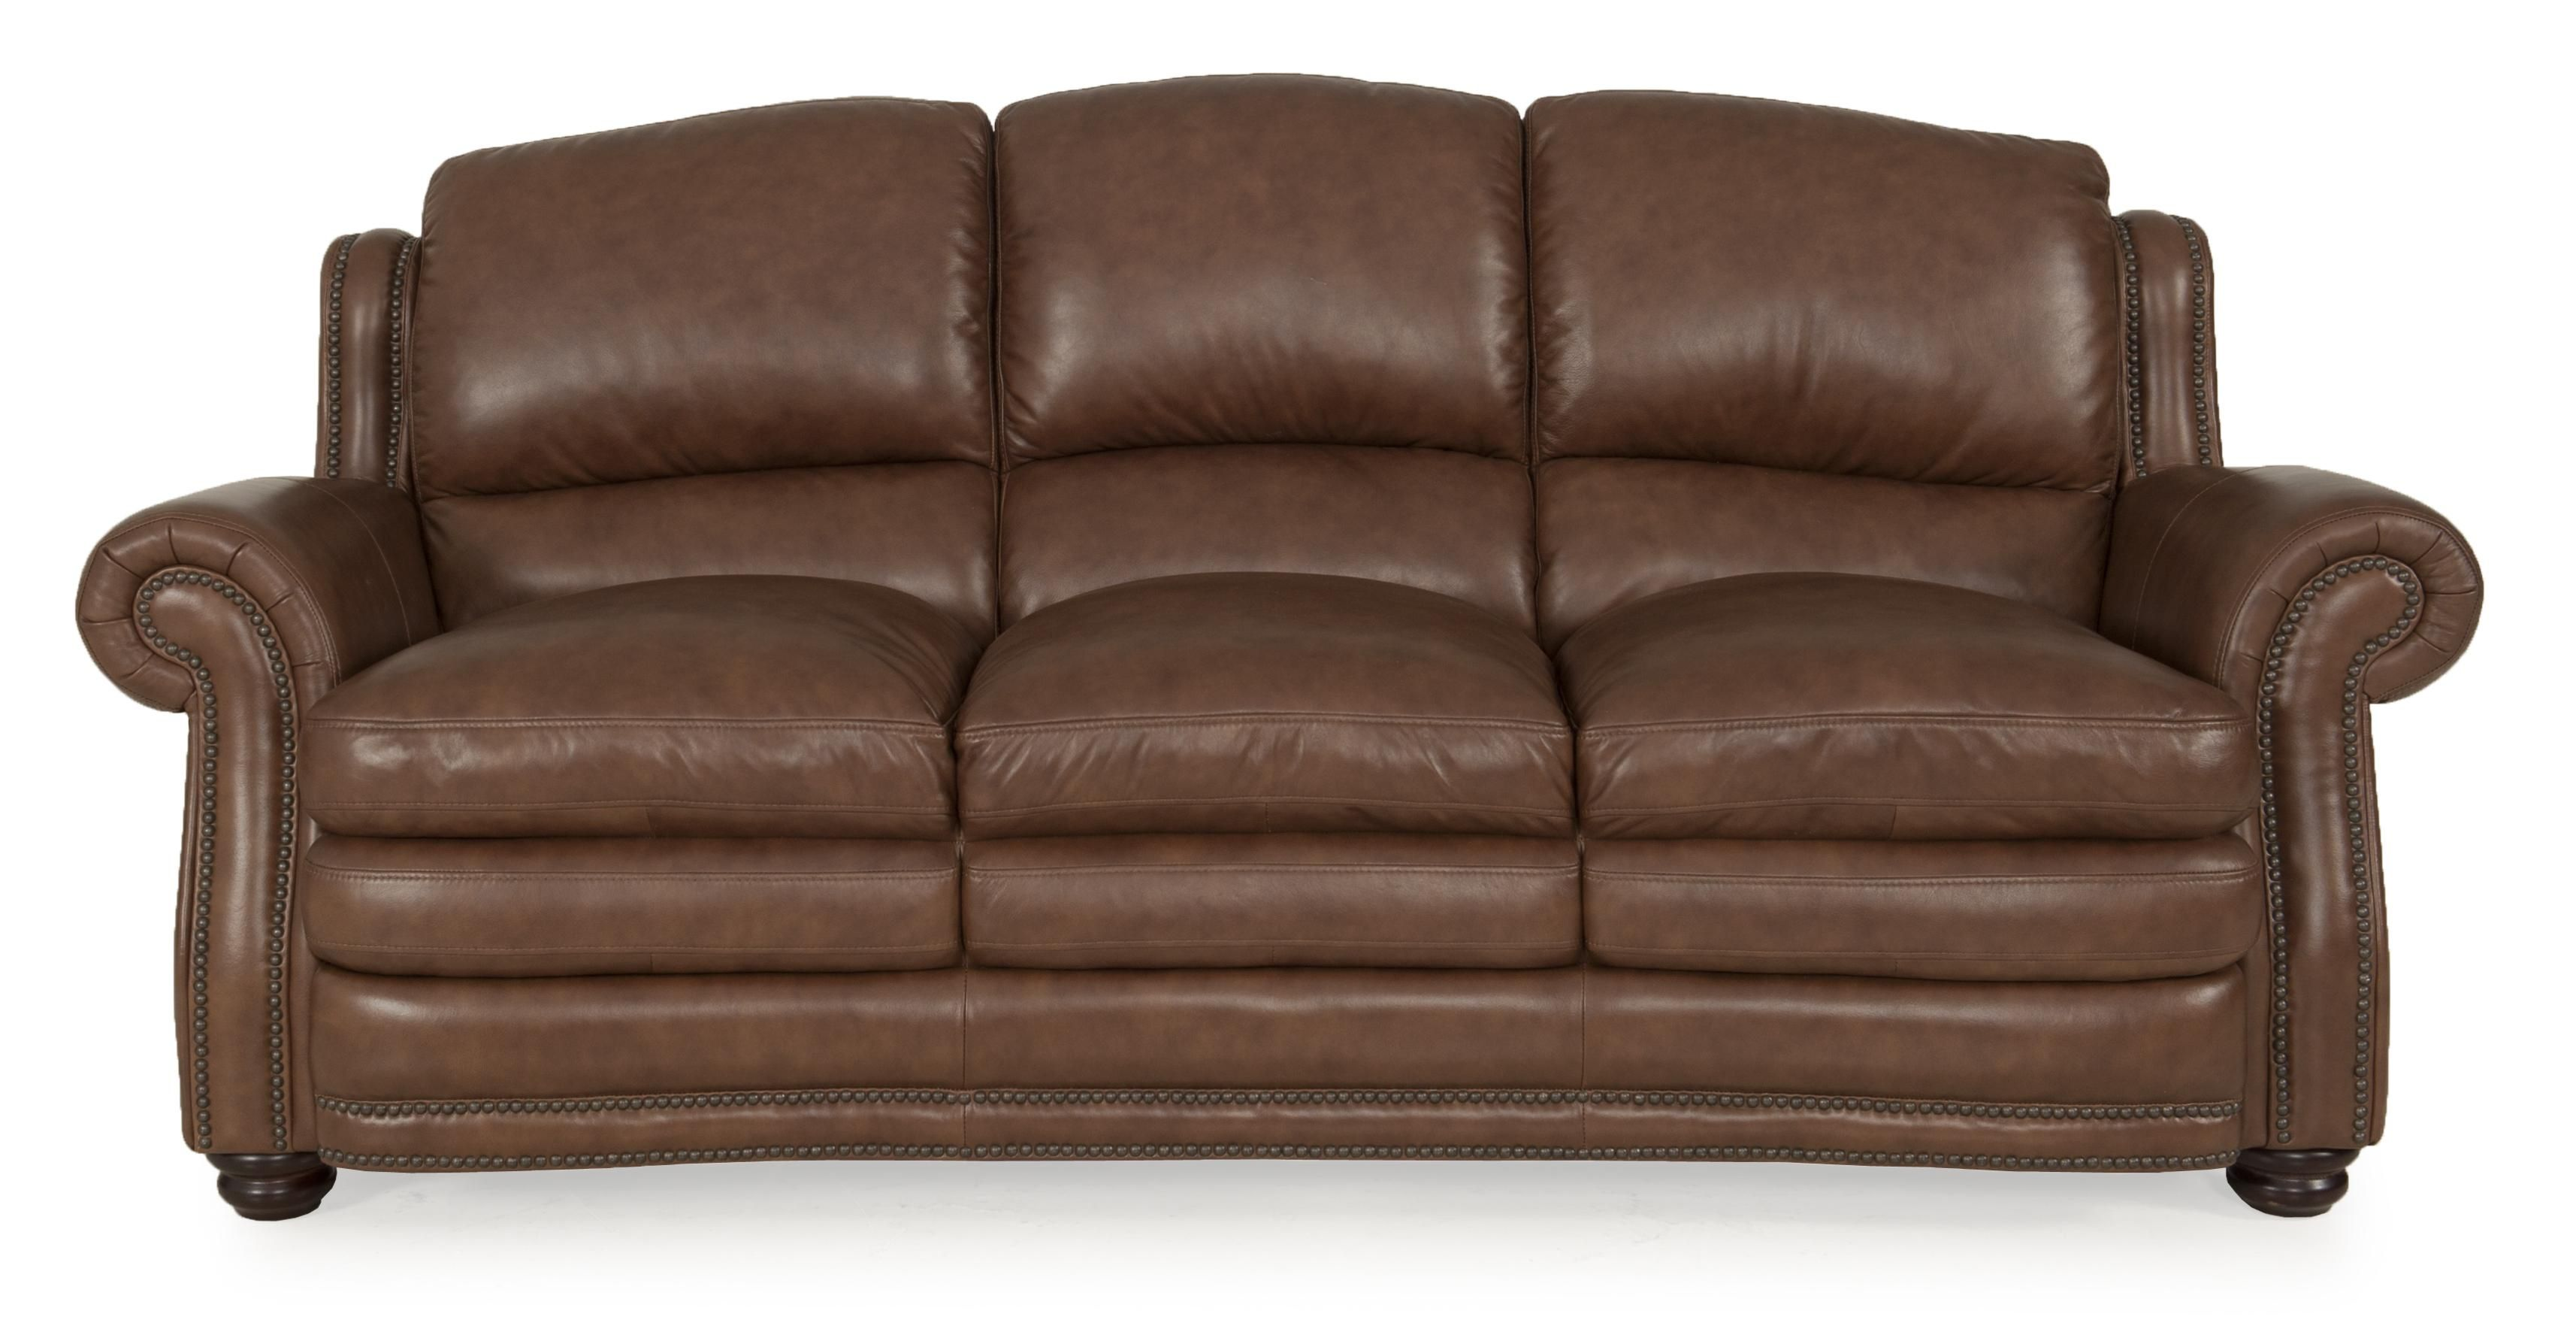 - Futura Leather 8438 Chesapeake Leather Sofa - Great American Home